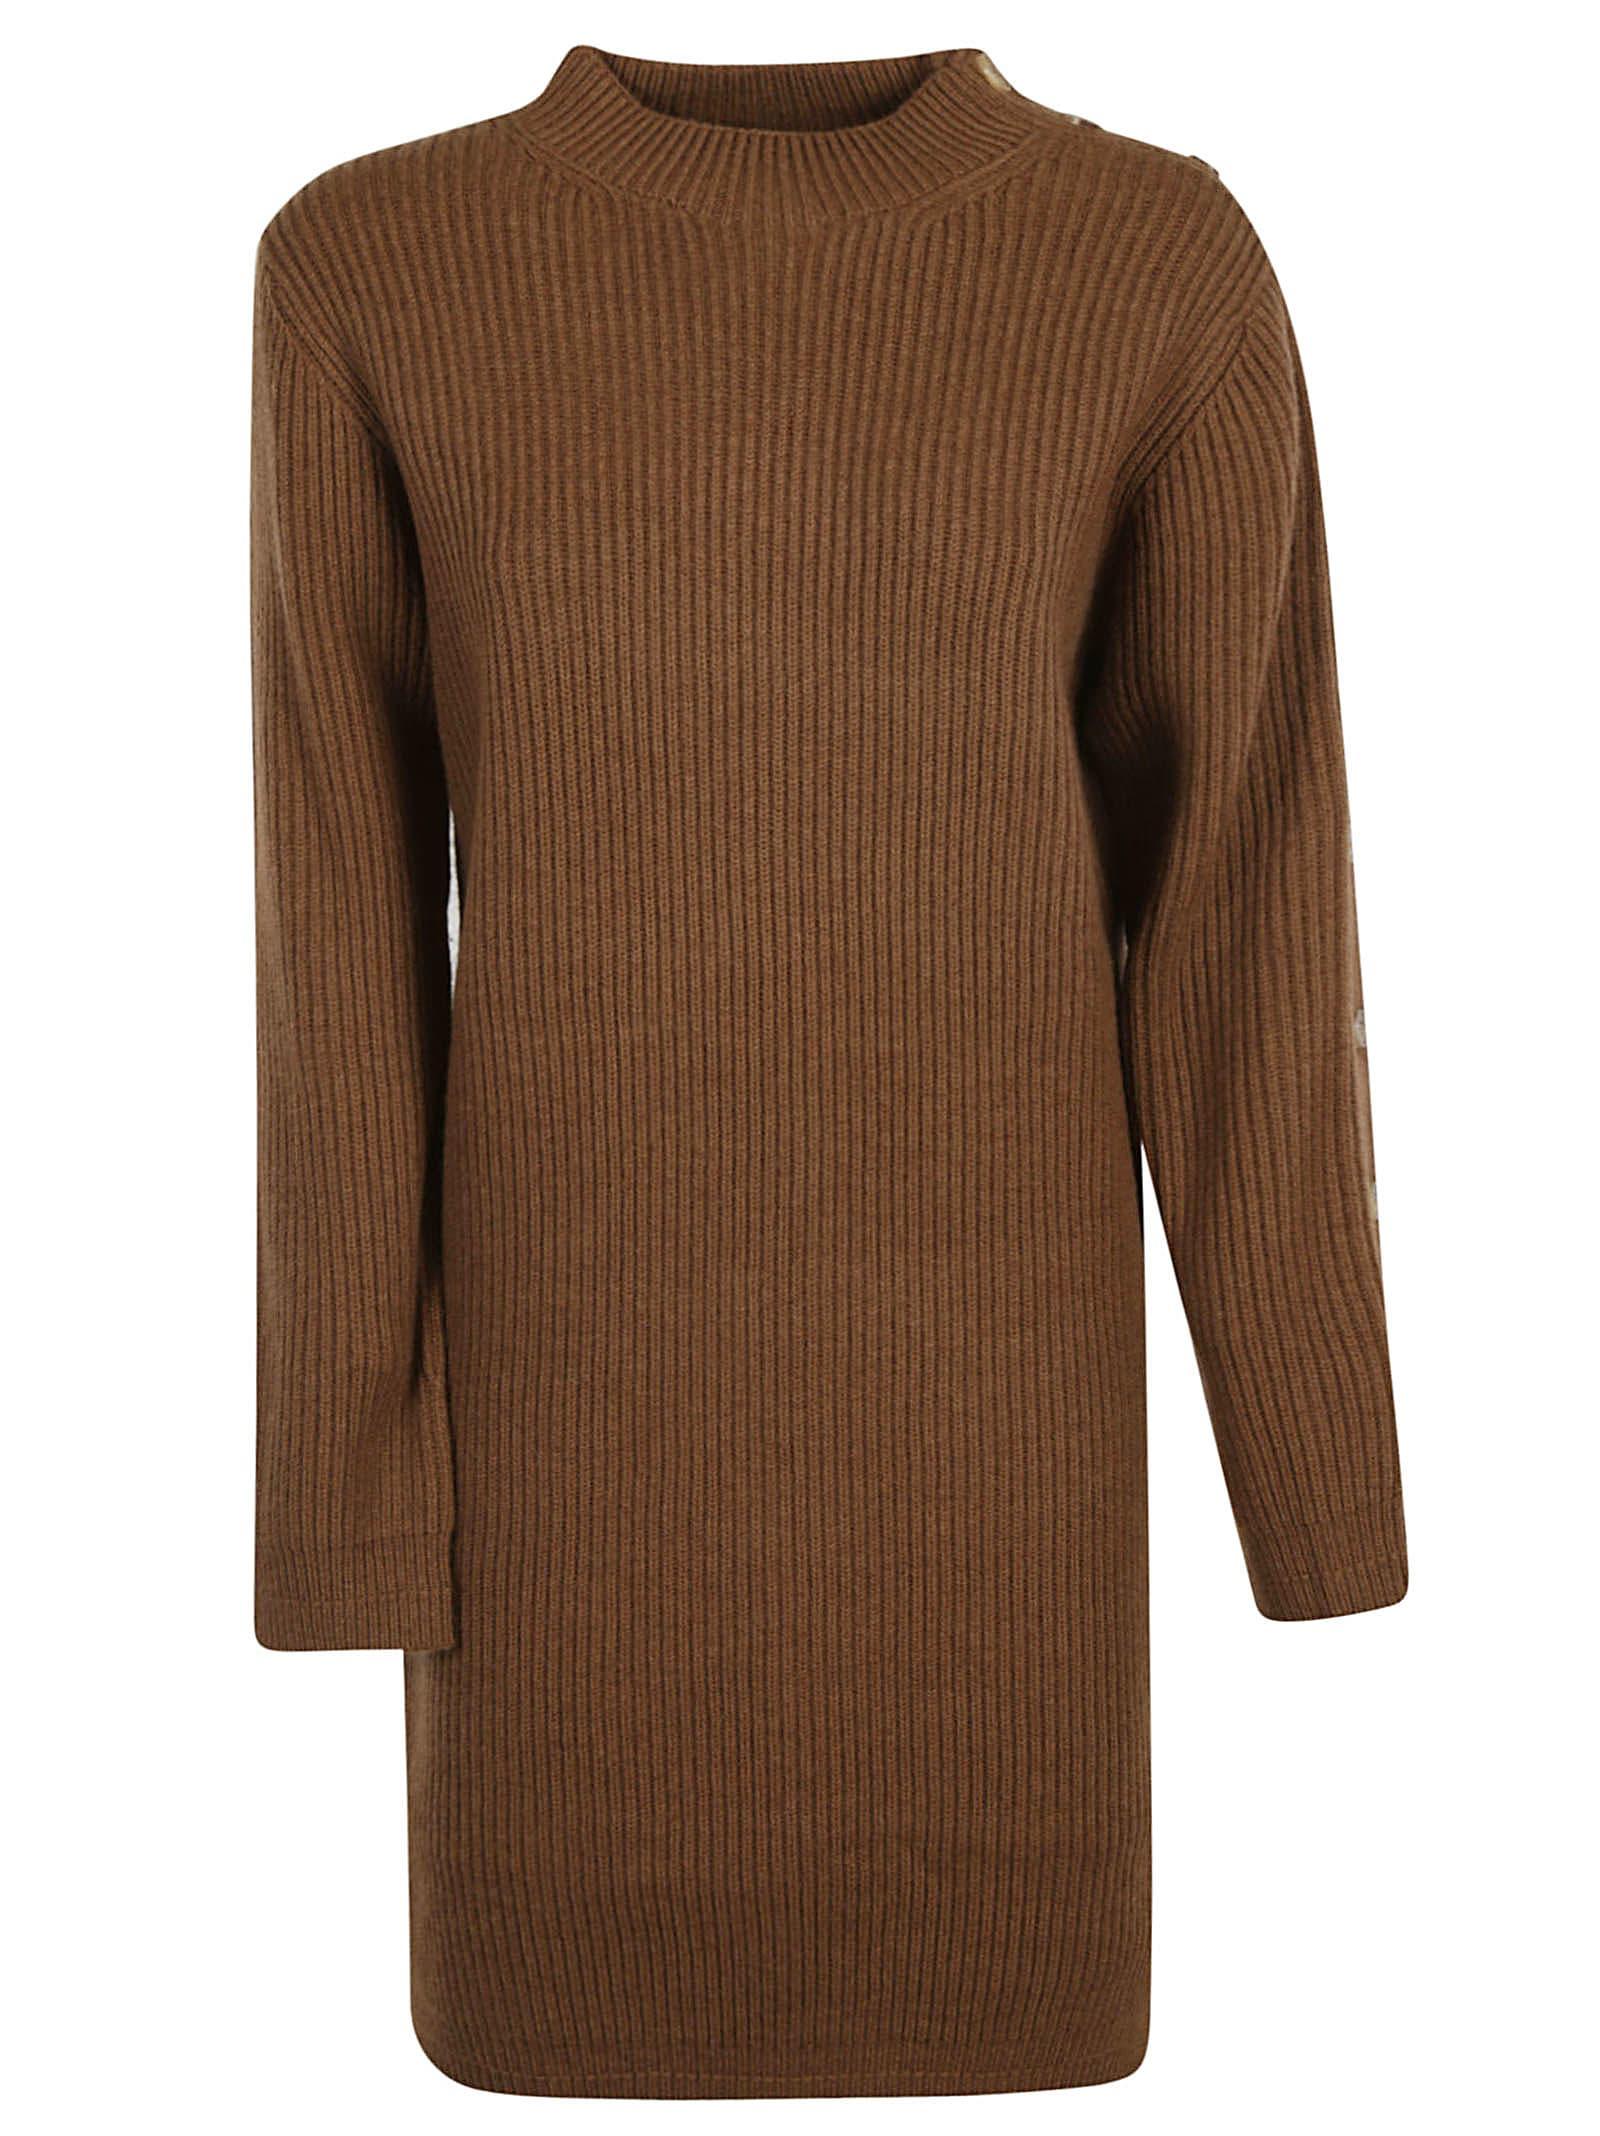 Acne Studios Sweater Dress